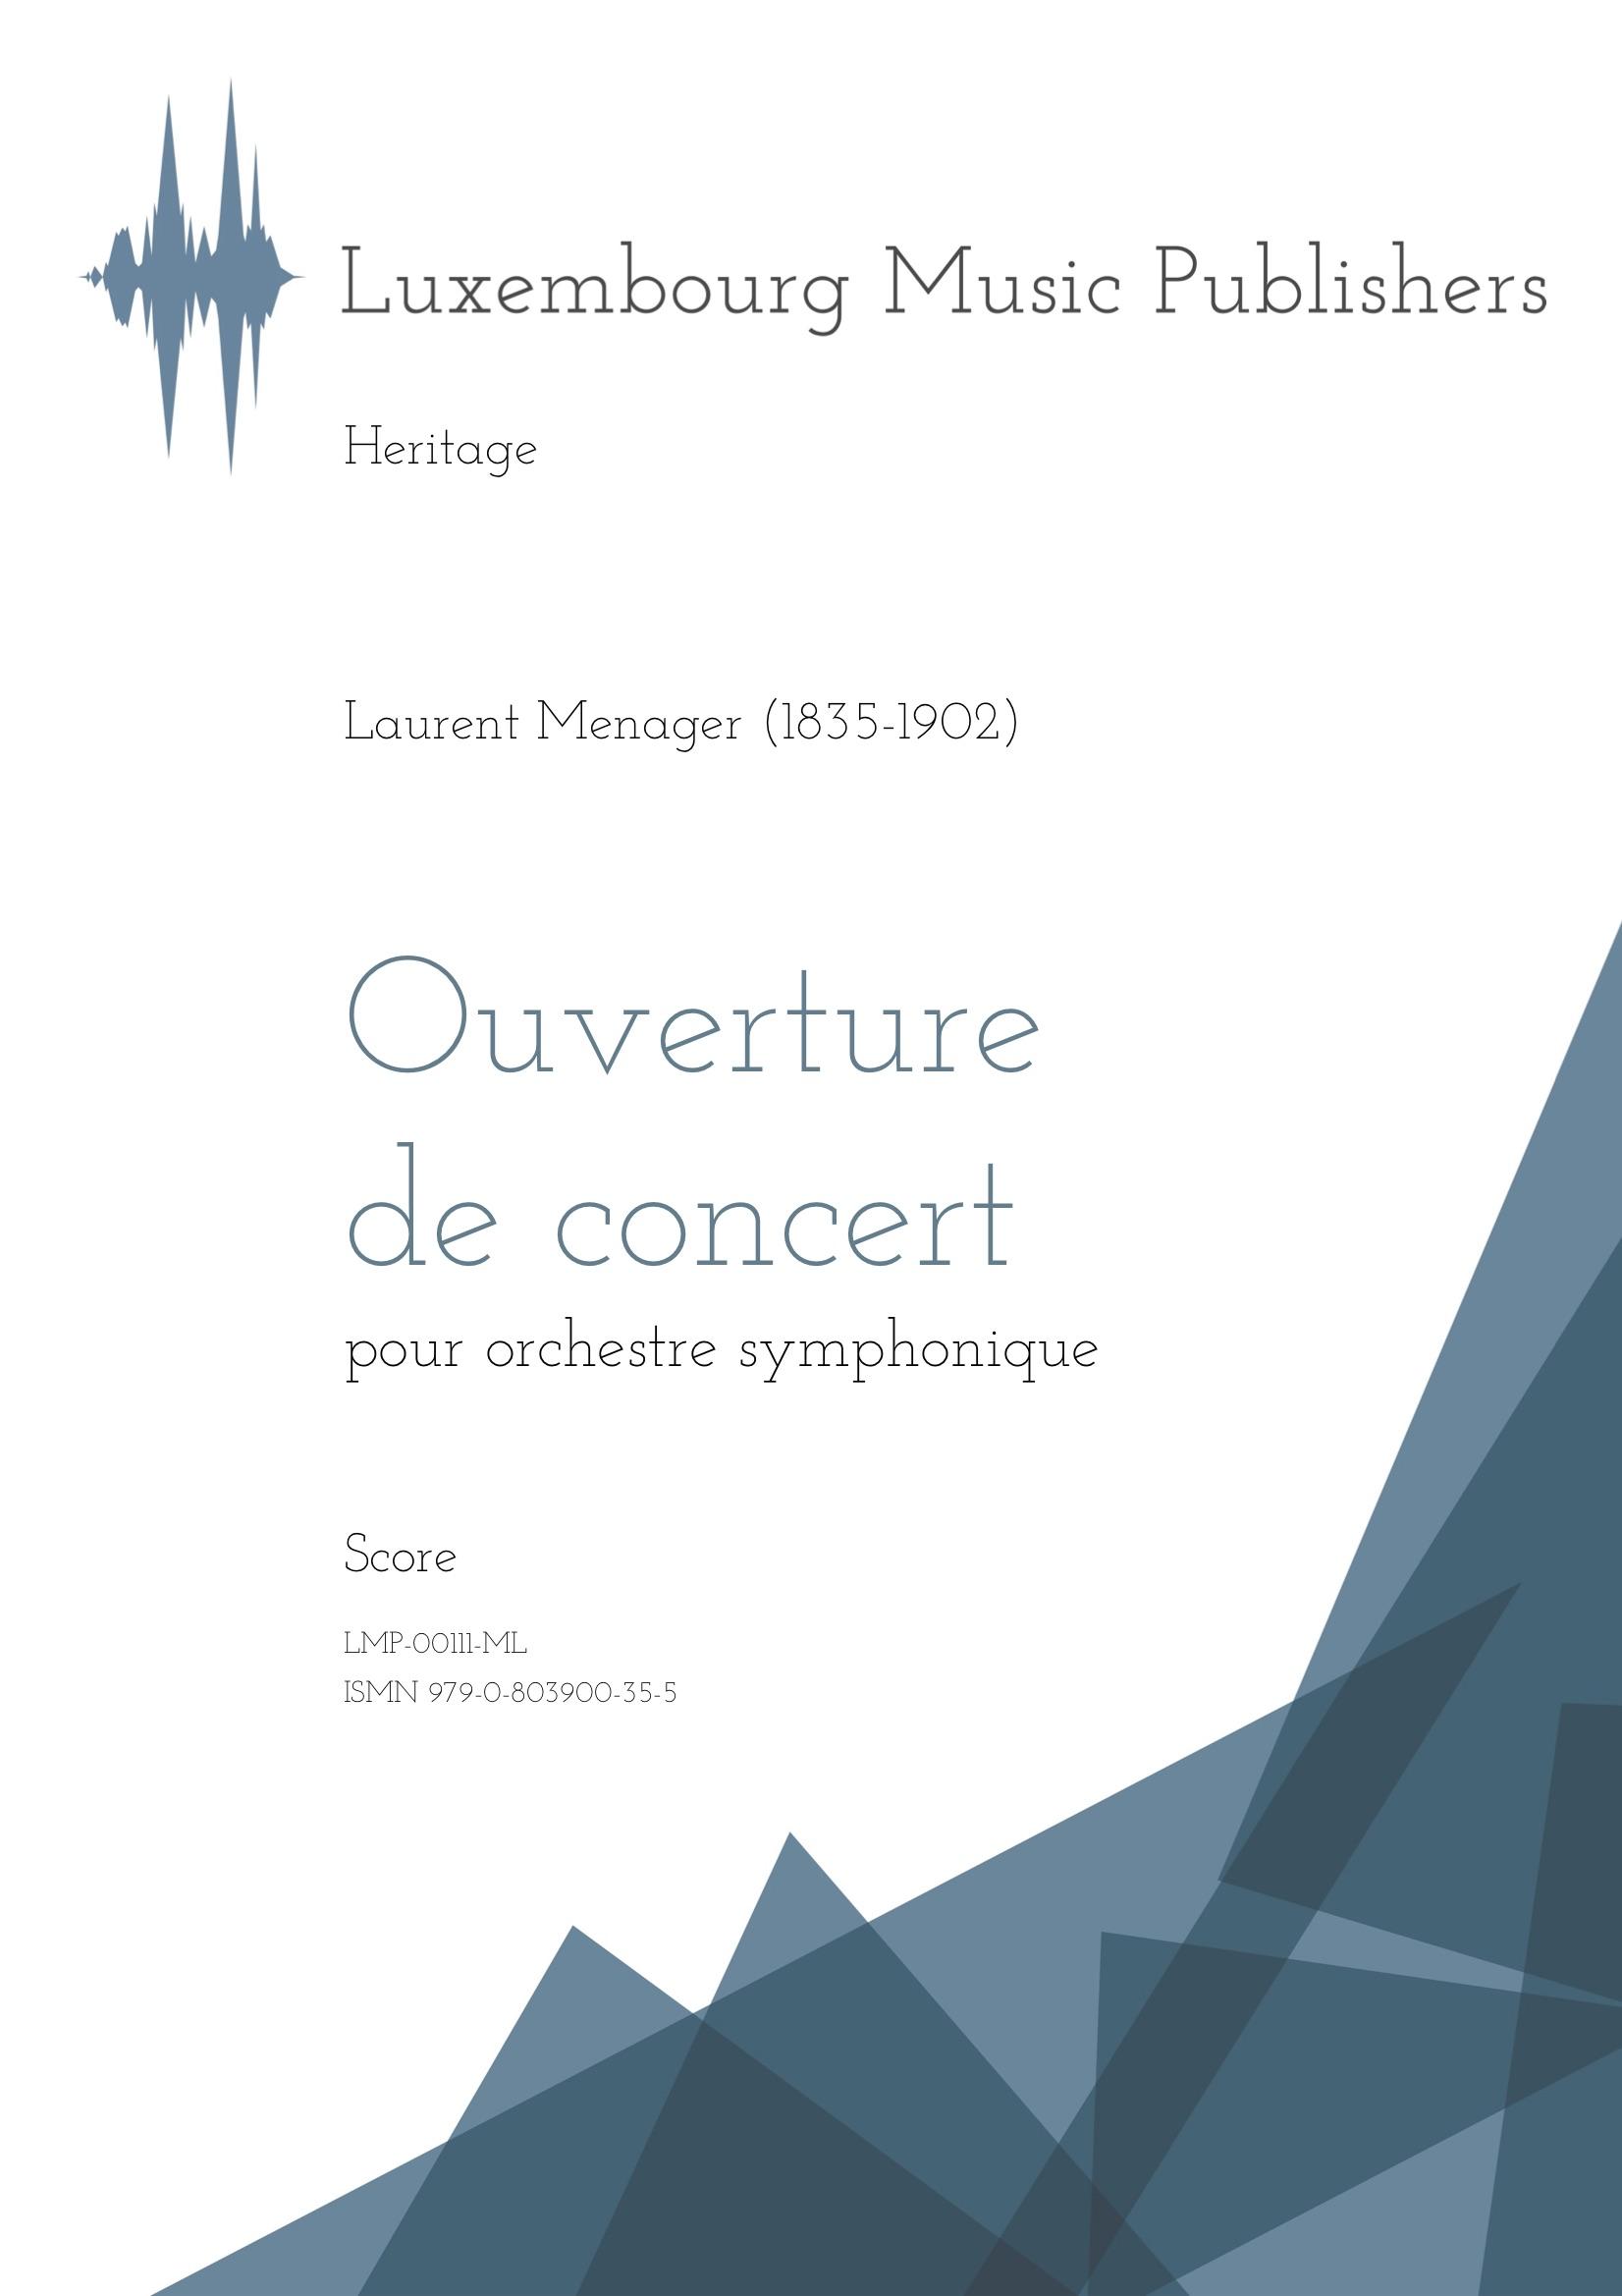 Ouverture de concert. Sheet Music by Laurent Menager, composer. Music for symphonic orchestra. Festive orchestral music. Score.